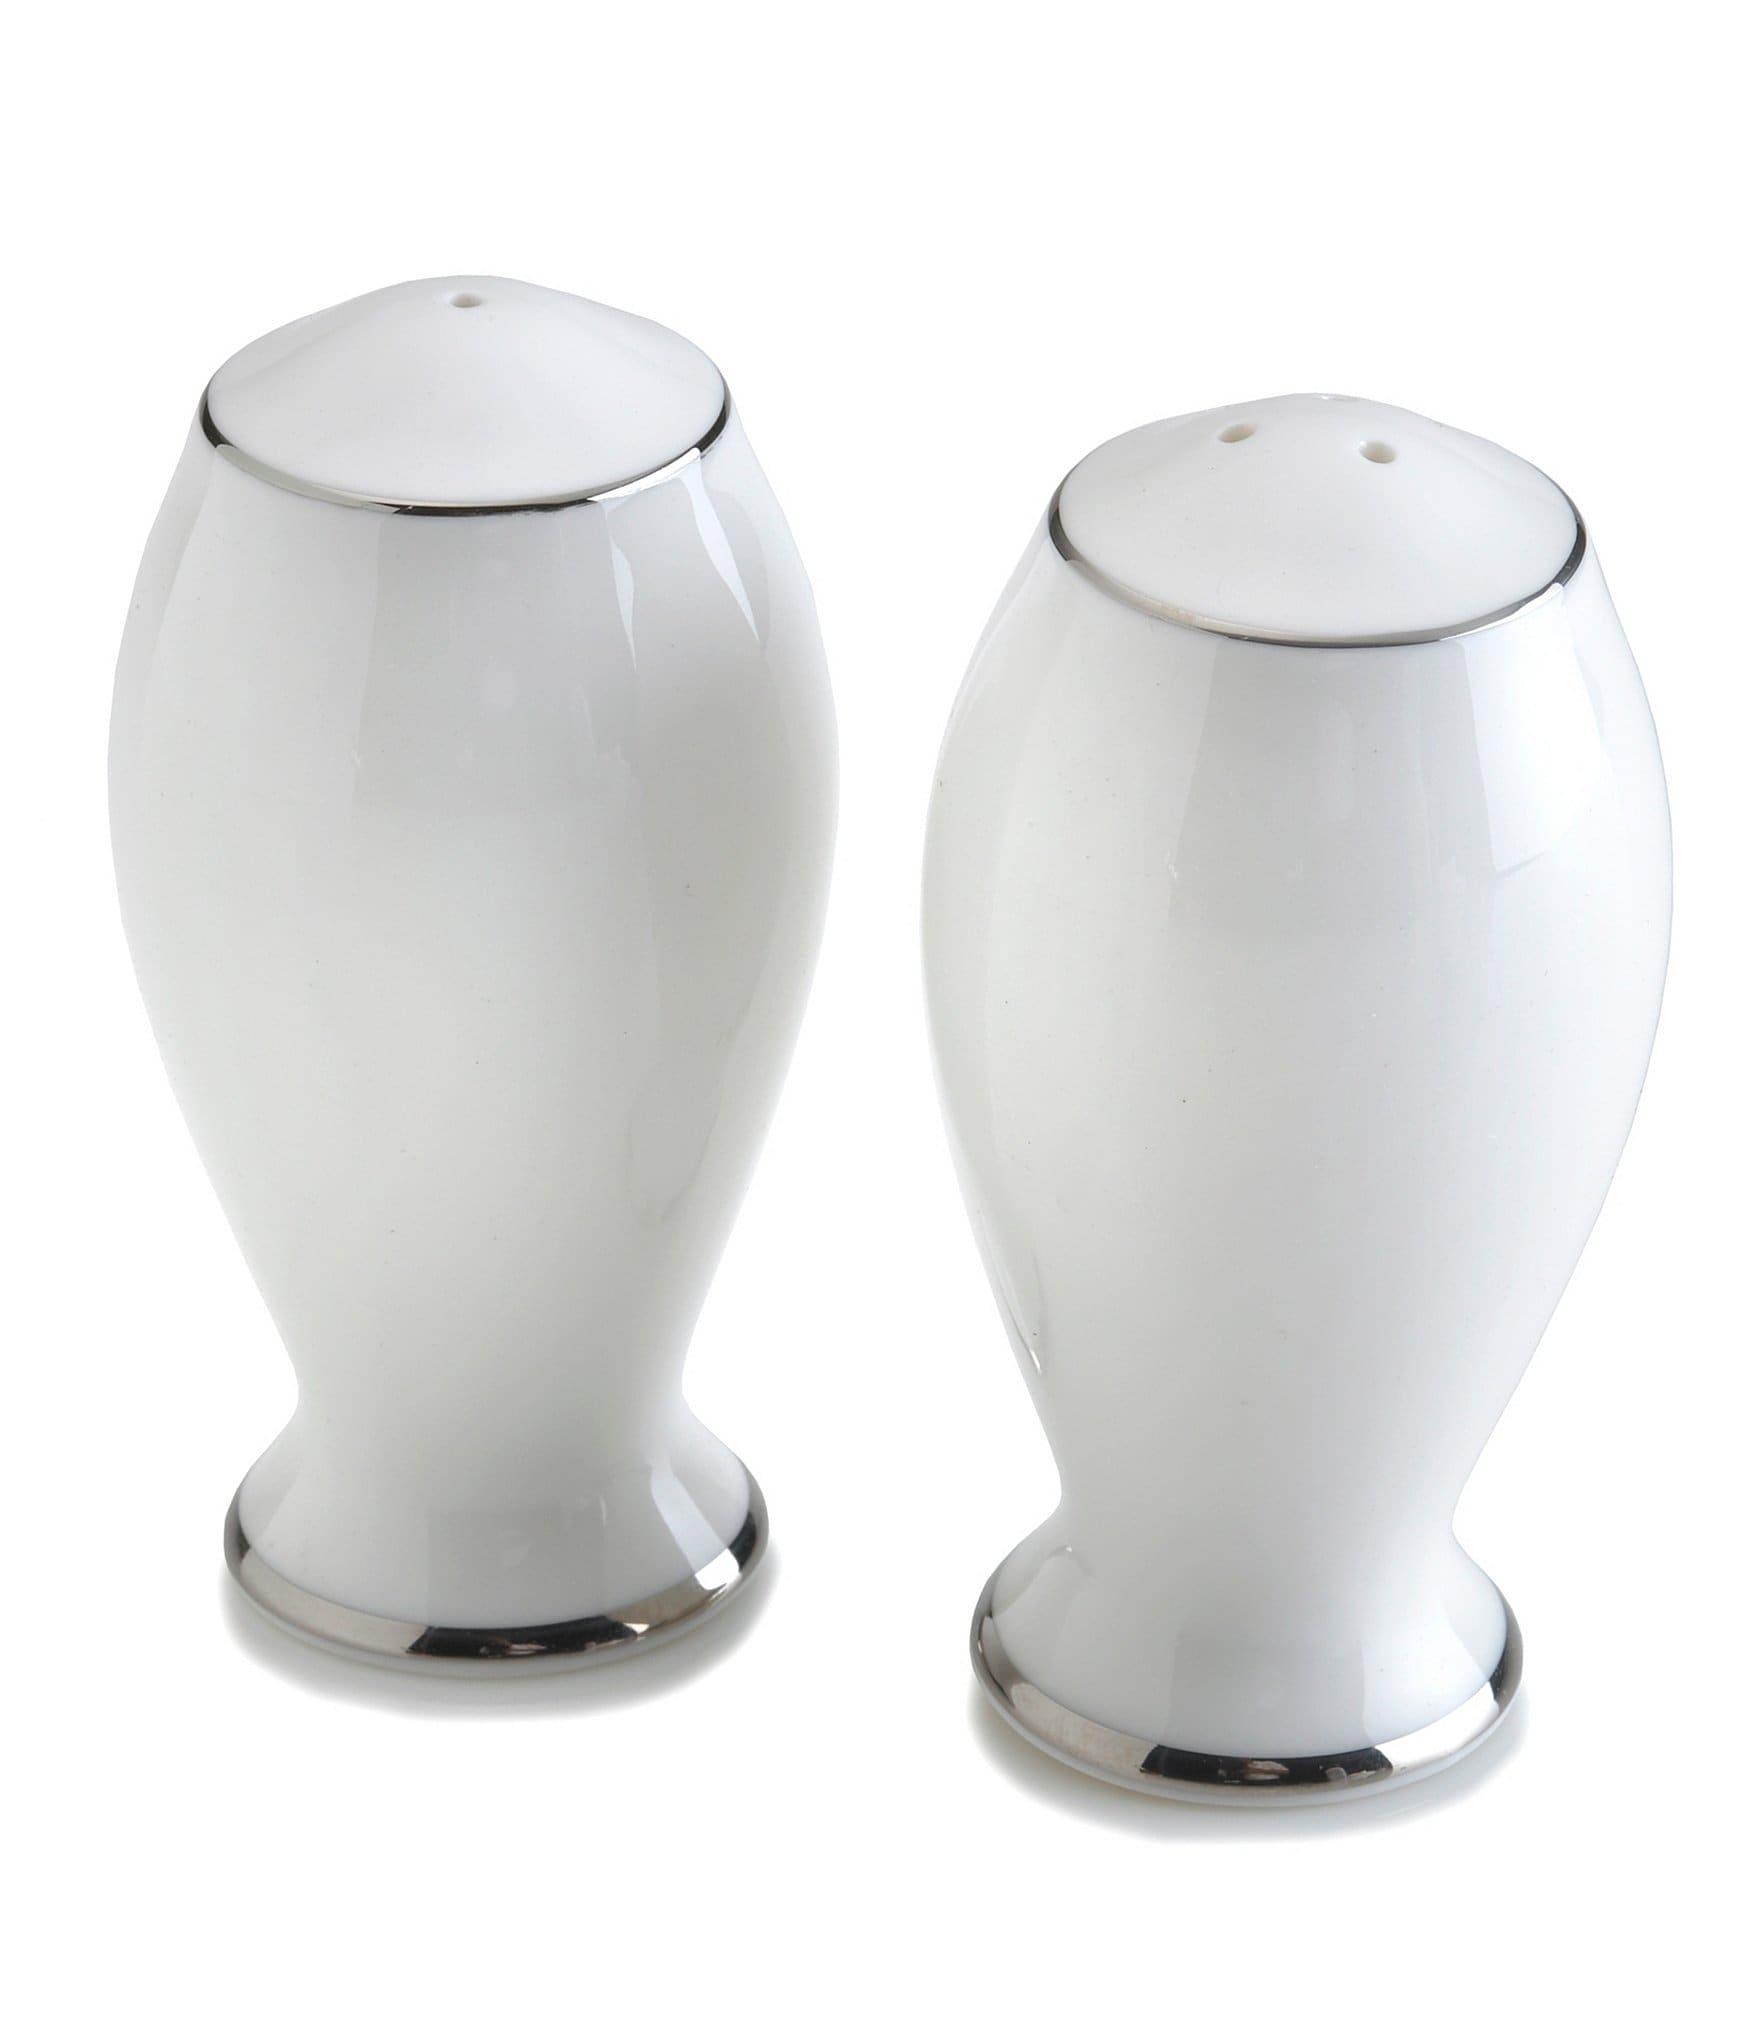 Home  Dining & Entertaining  Serveware  Salt & Pepper Shakers   Dillards